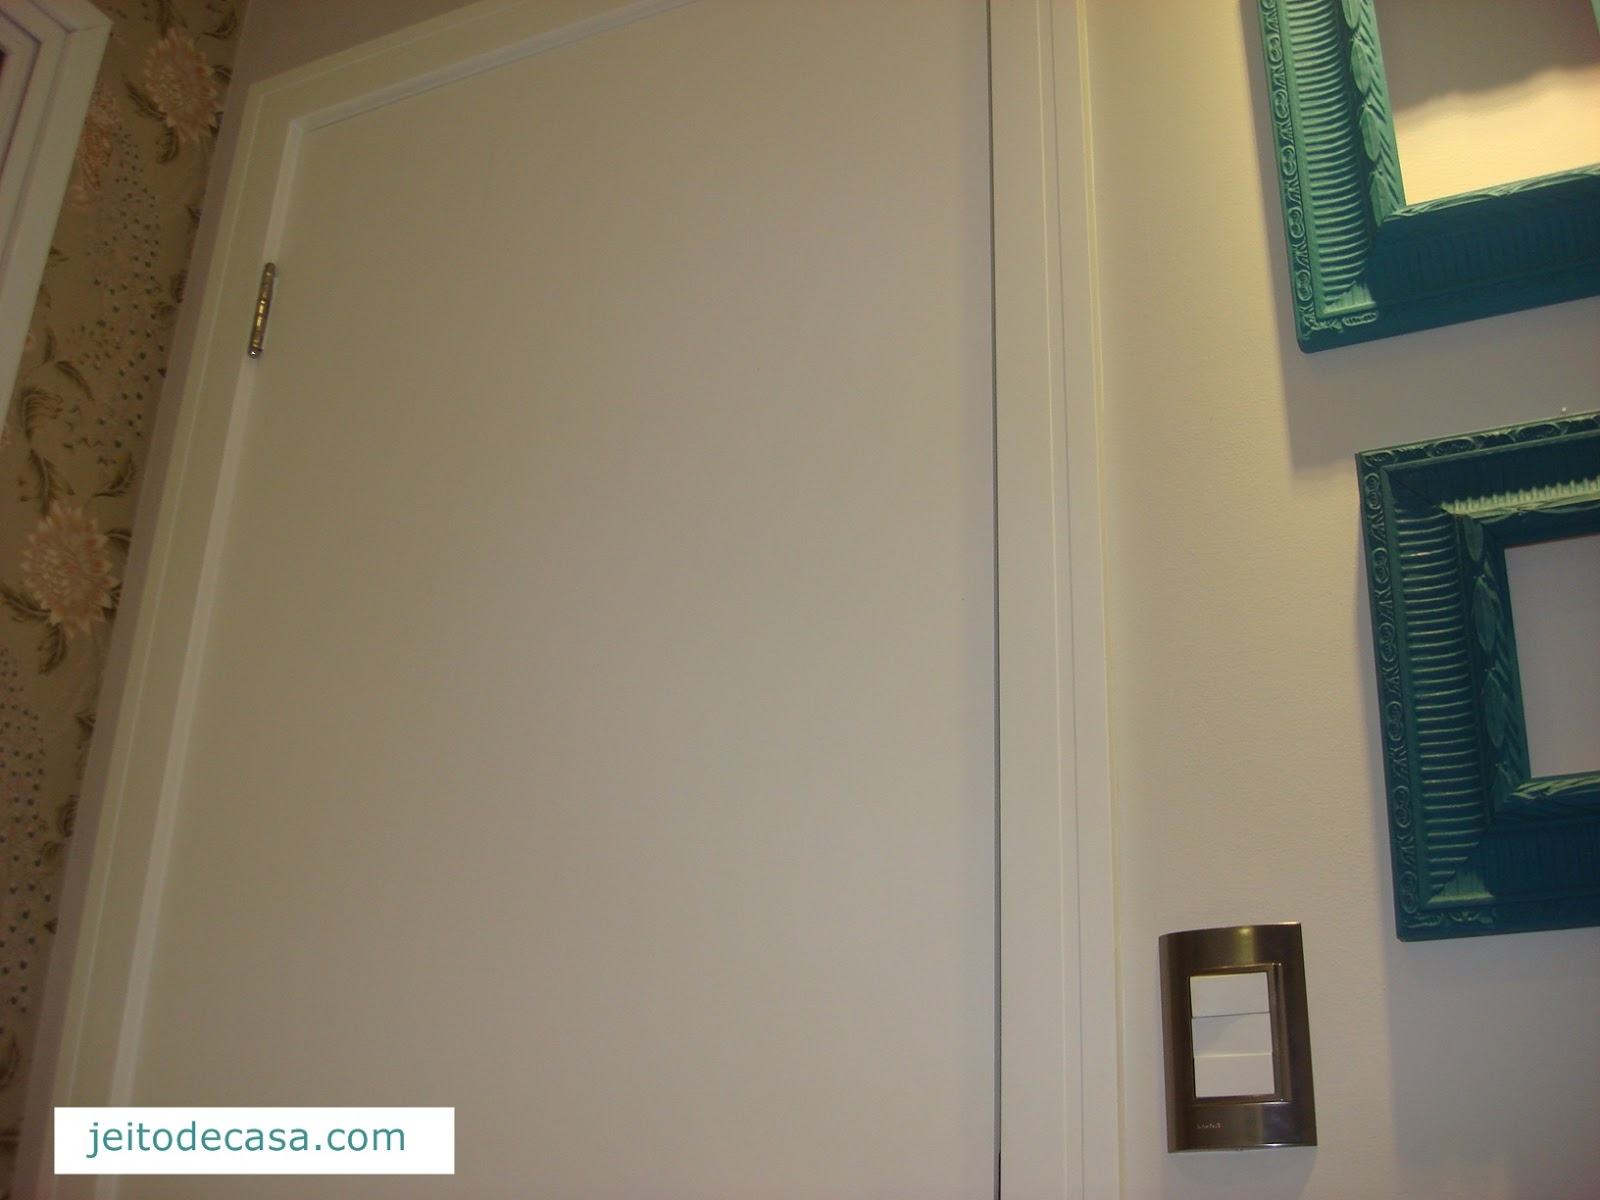 decoracao lavabo papel de parede : decoracao lavabo papel de parede:Lavabo decorado com papel de parede – Jeito de Casa – Blog de